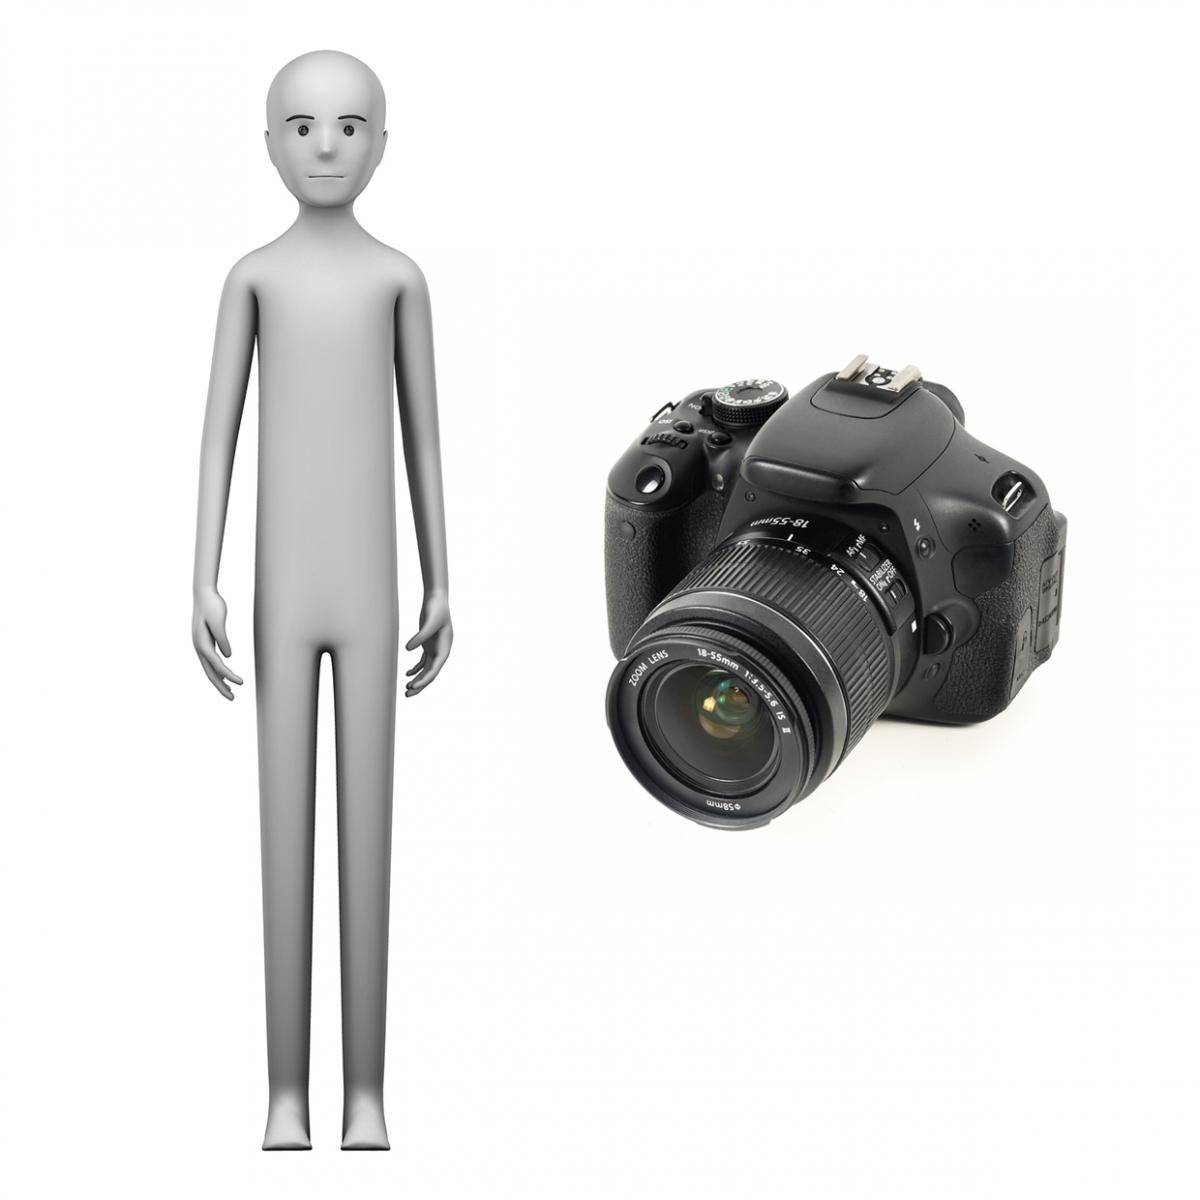 Imagen en la que se ve el concepto de fotógrafo o fotógrafa